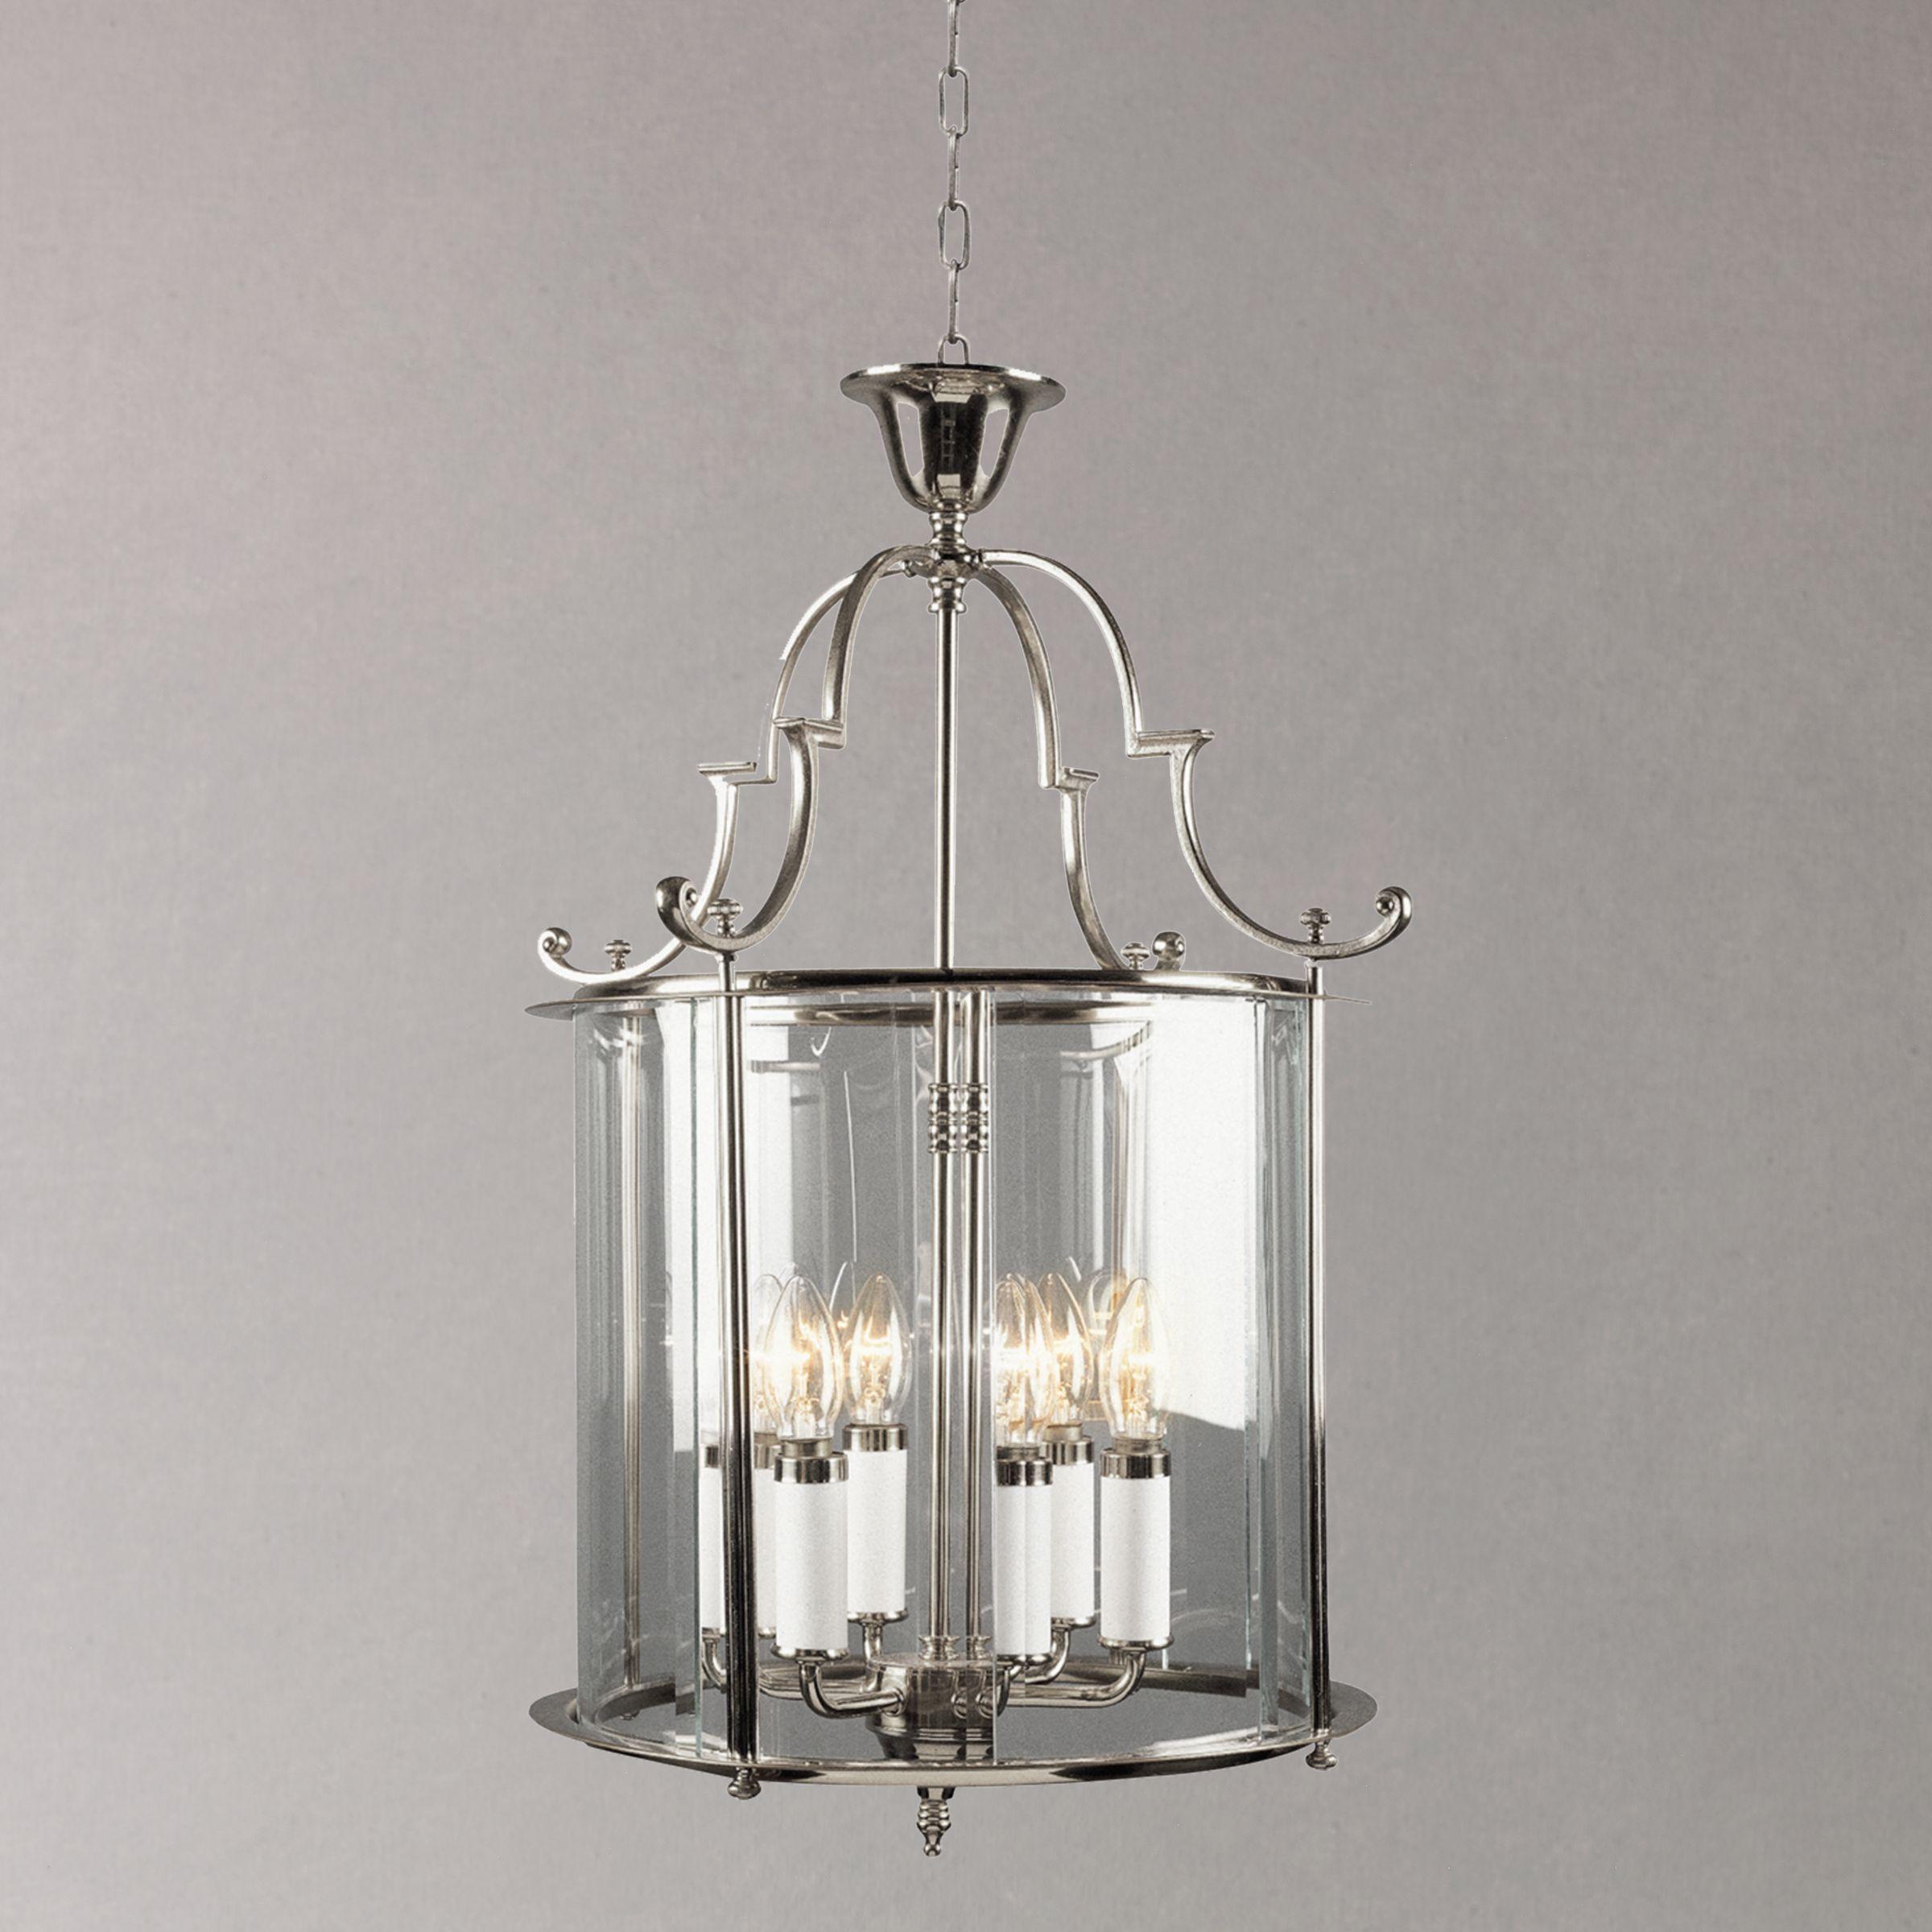 Impex Bloomsbury Ceiling Light, Chrome, 15''